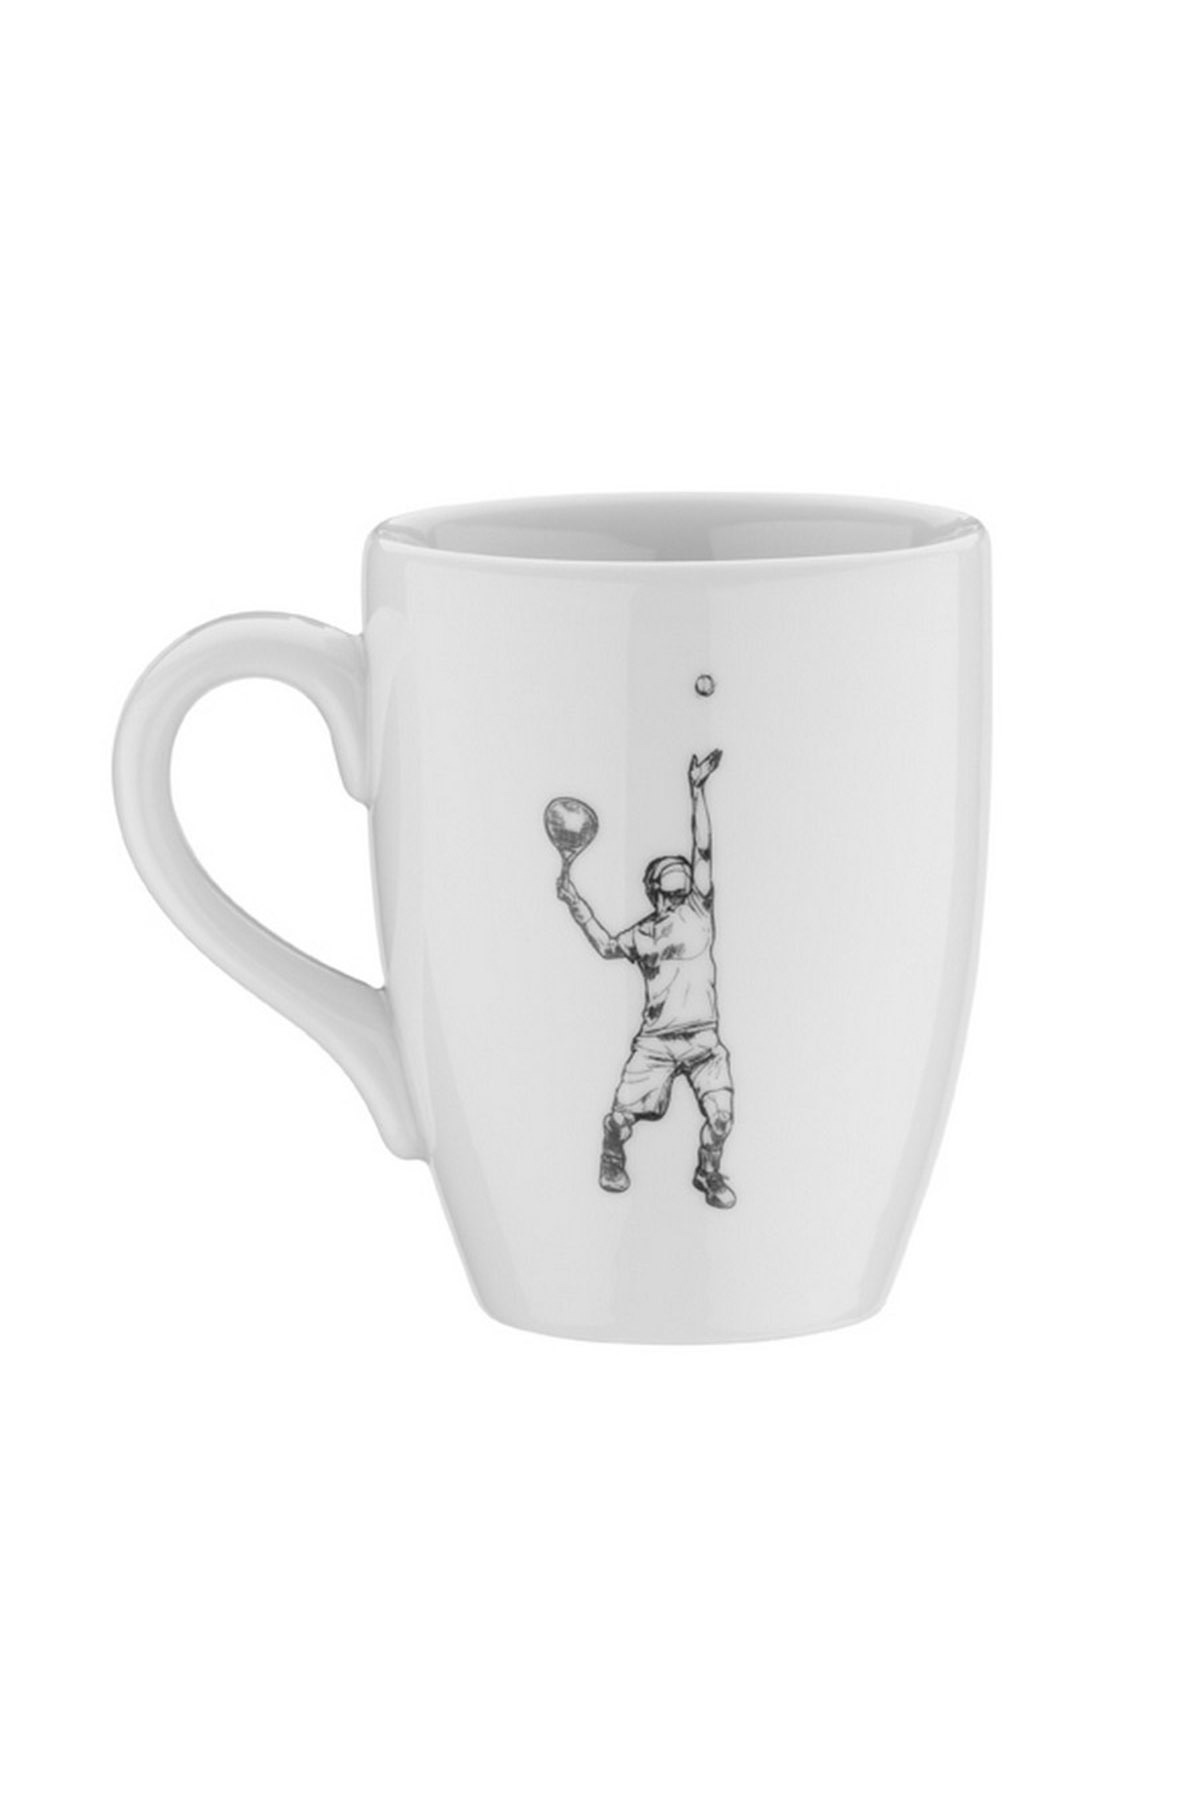 Kütahya Porselen - Kütahya Porselen Sporcu Mug Bardak Tenis